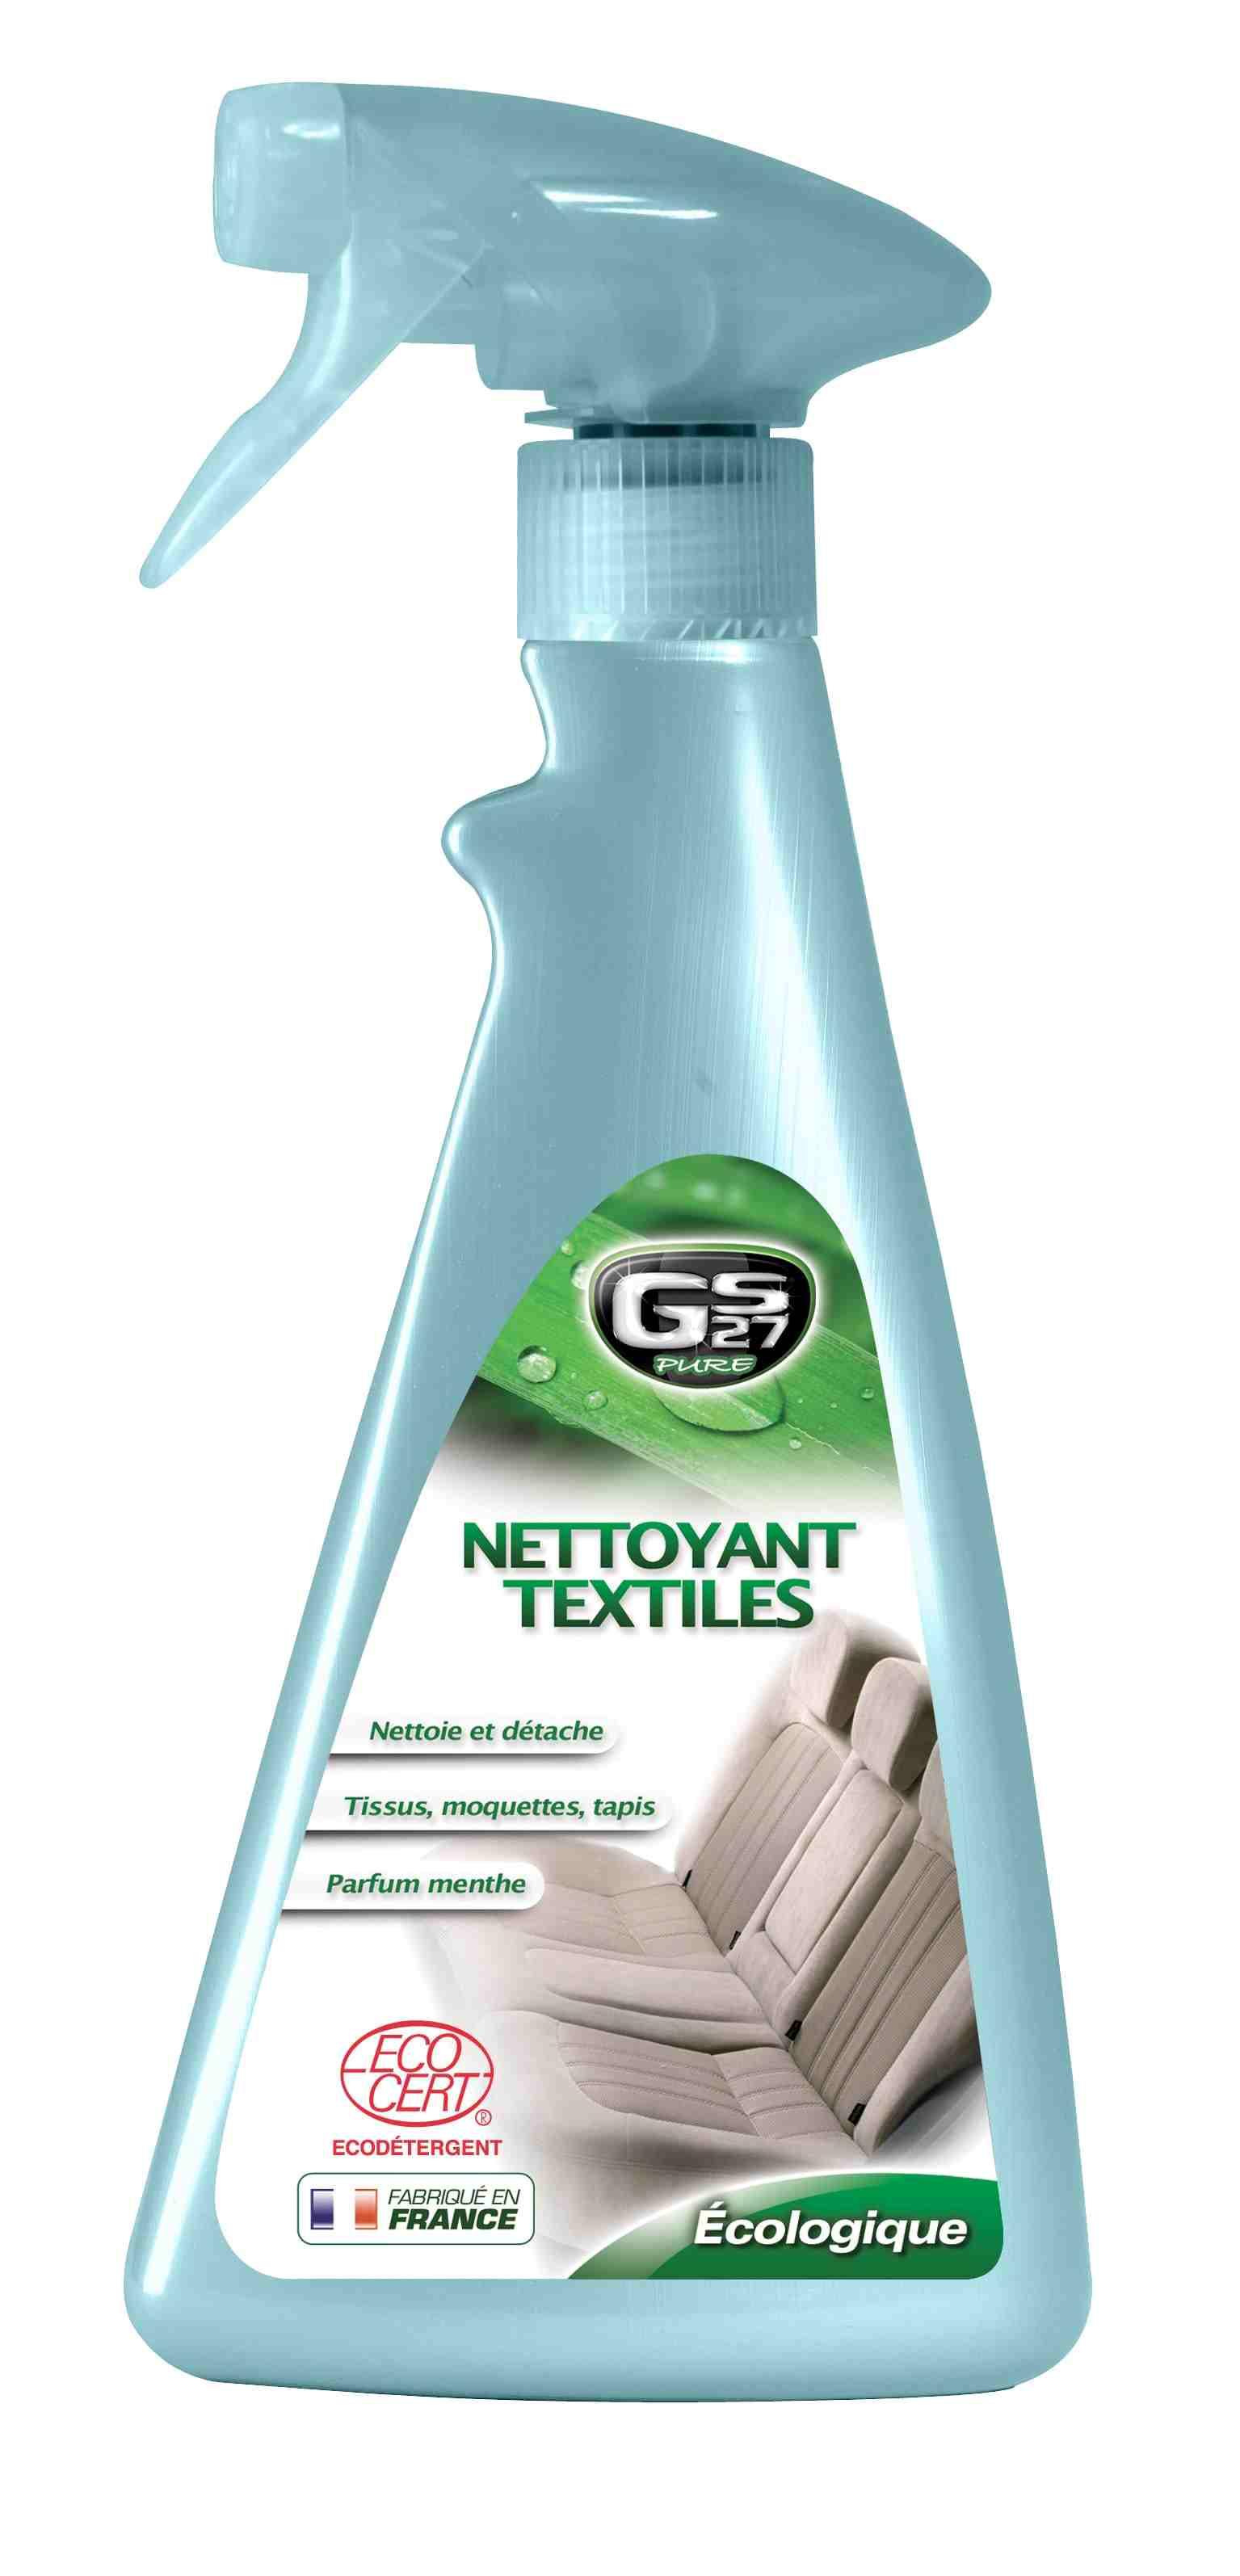 Nettoyant Textiles - ECOCERT - 500 ml